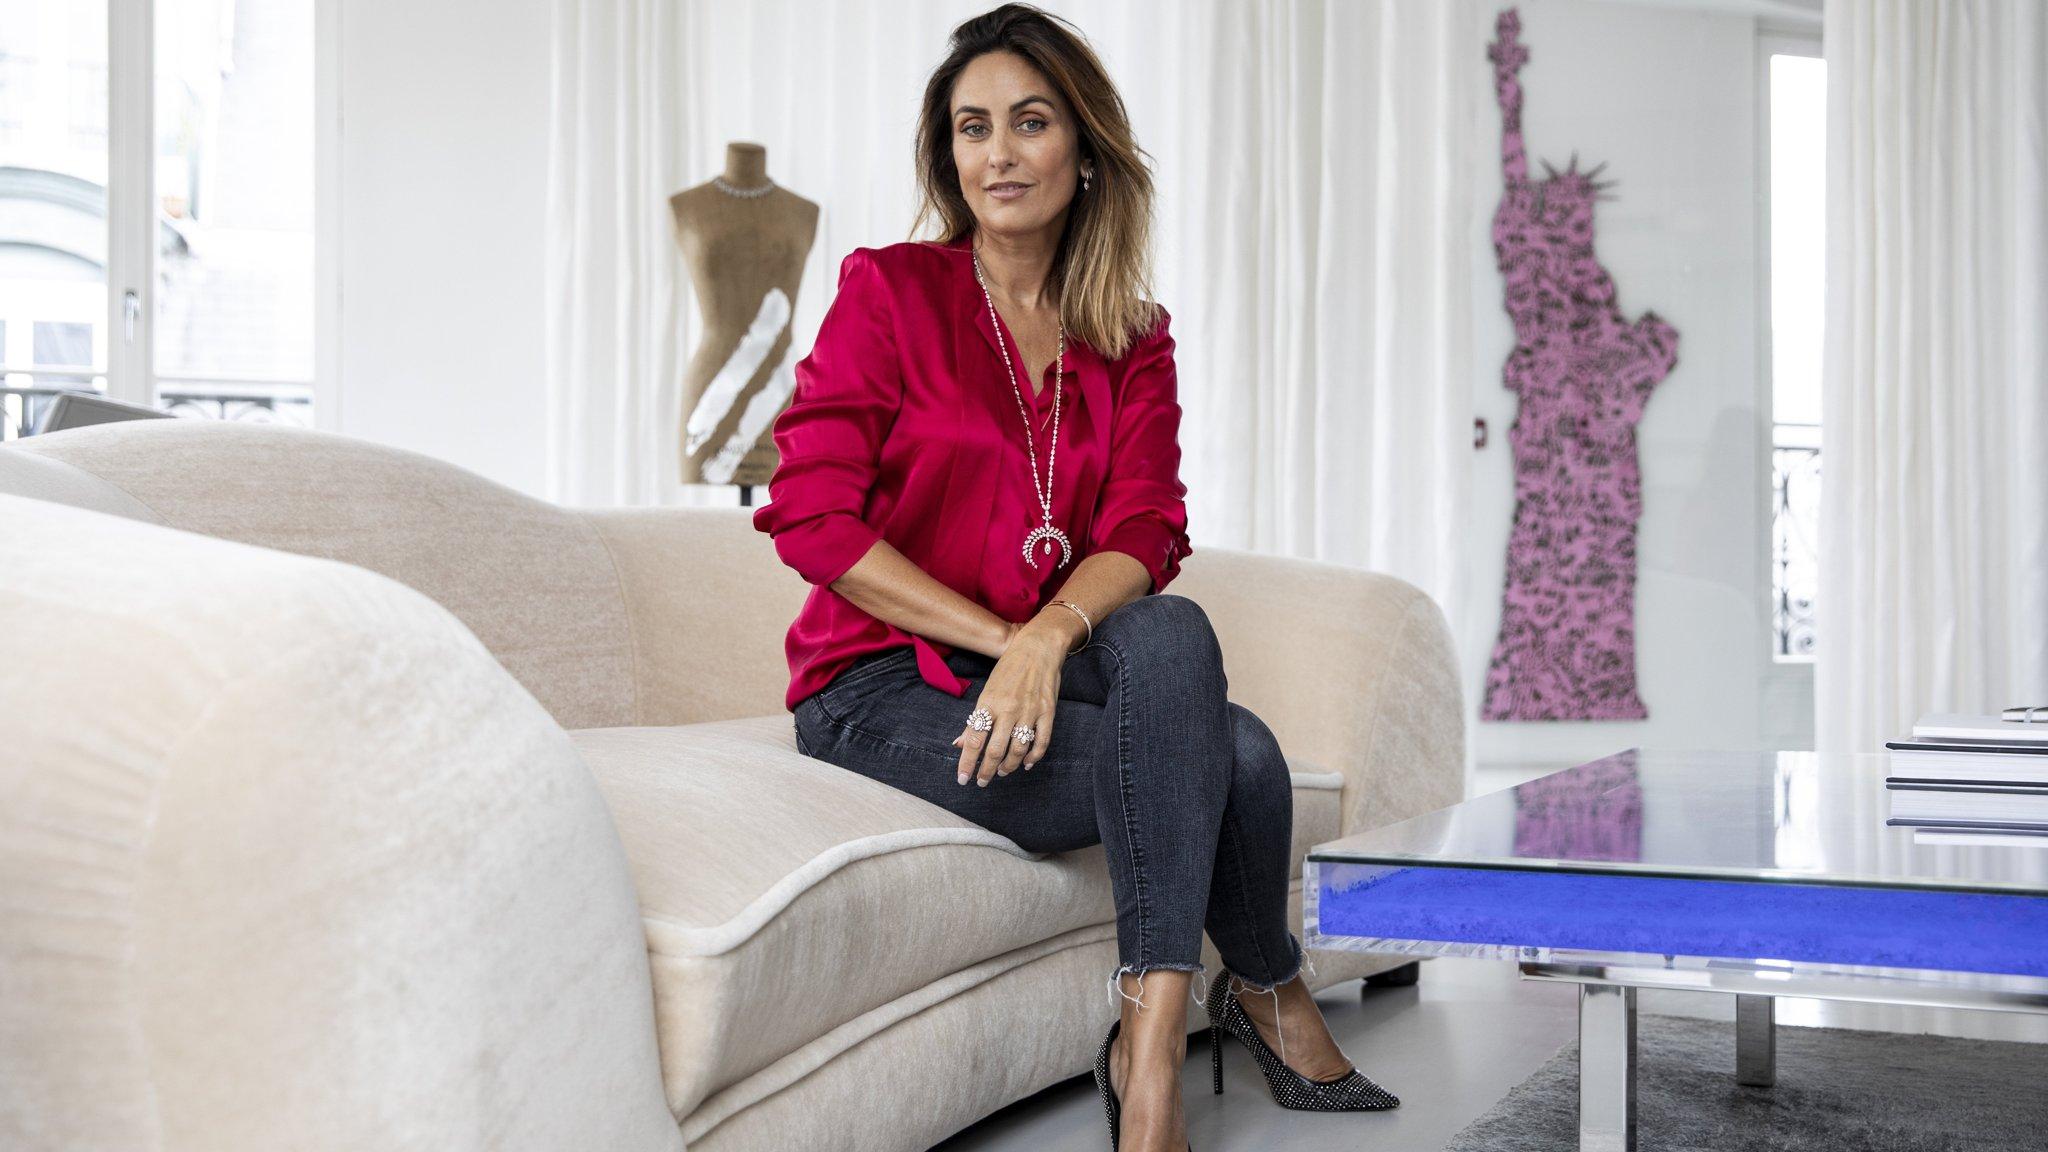 Valérie Messika: rebel recasting the role of diamonds